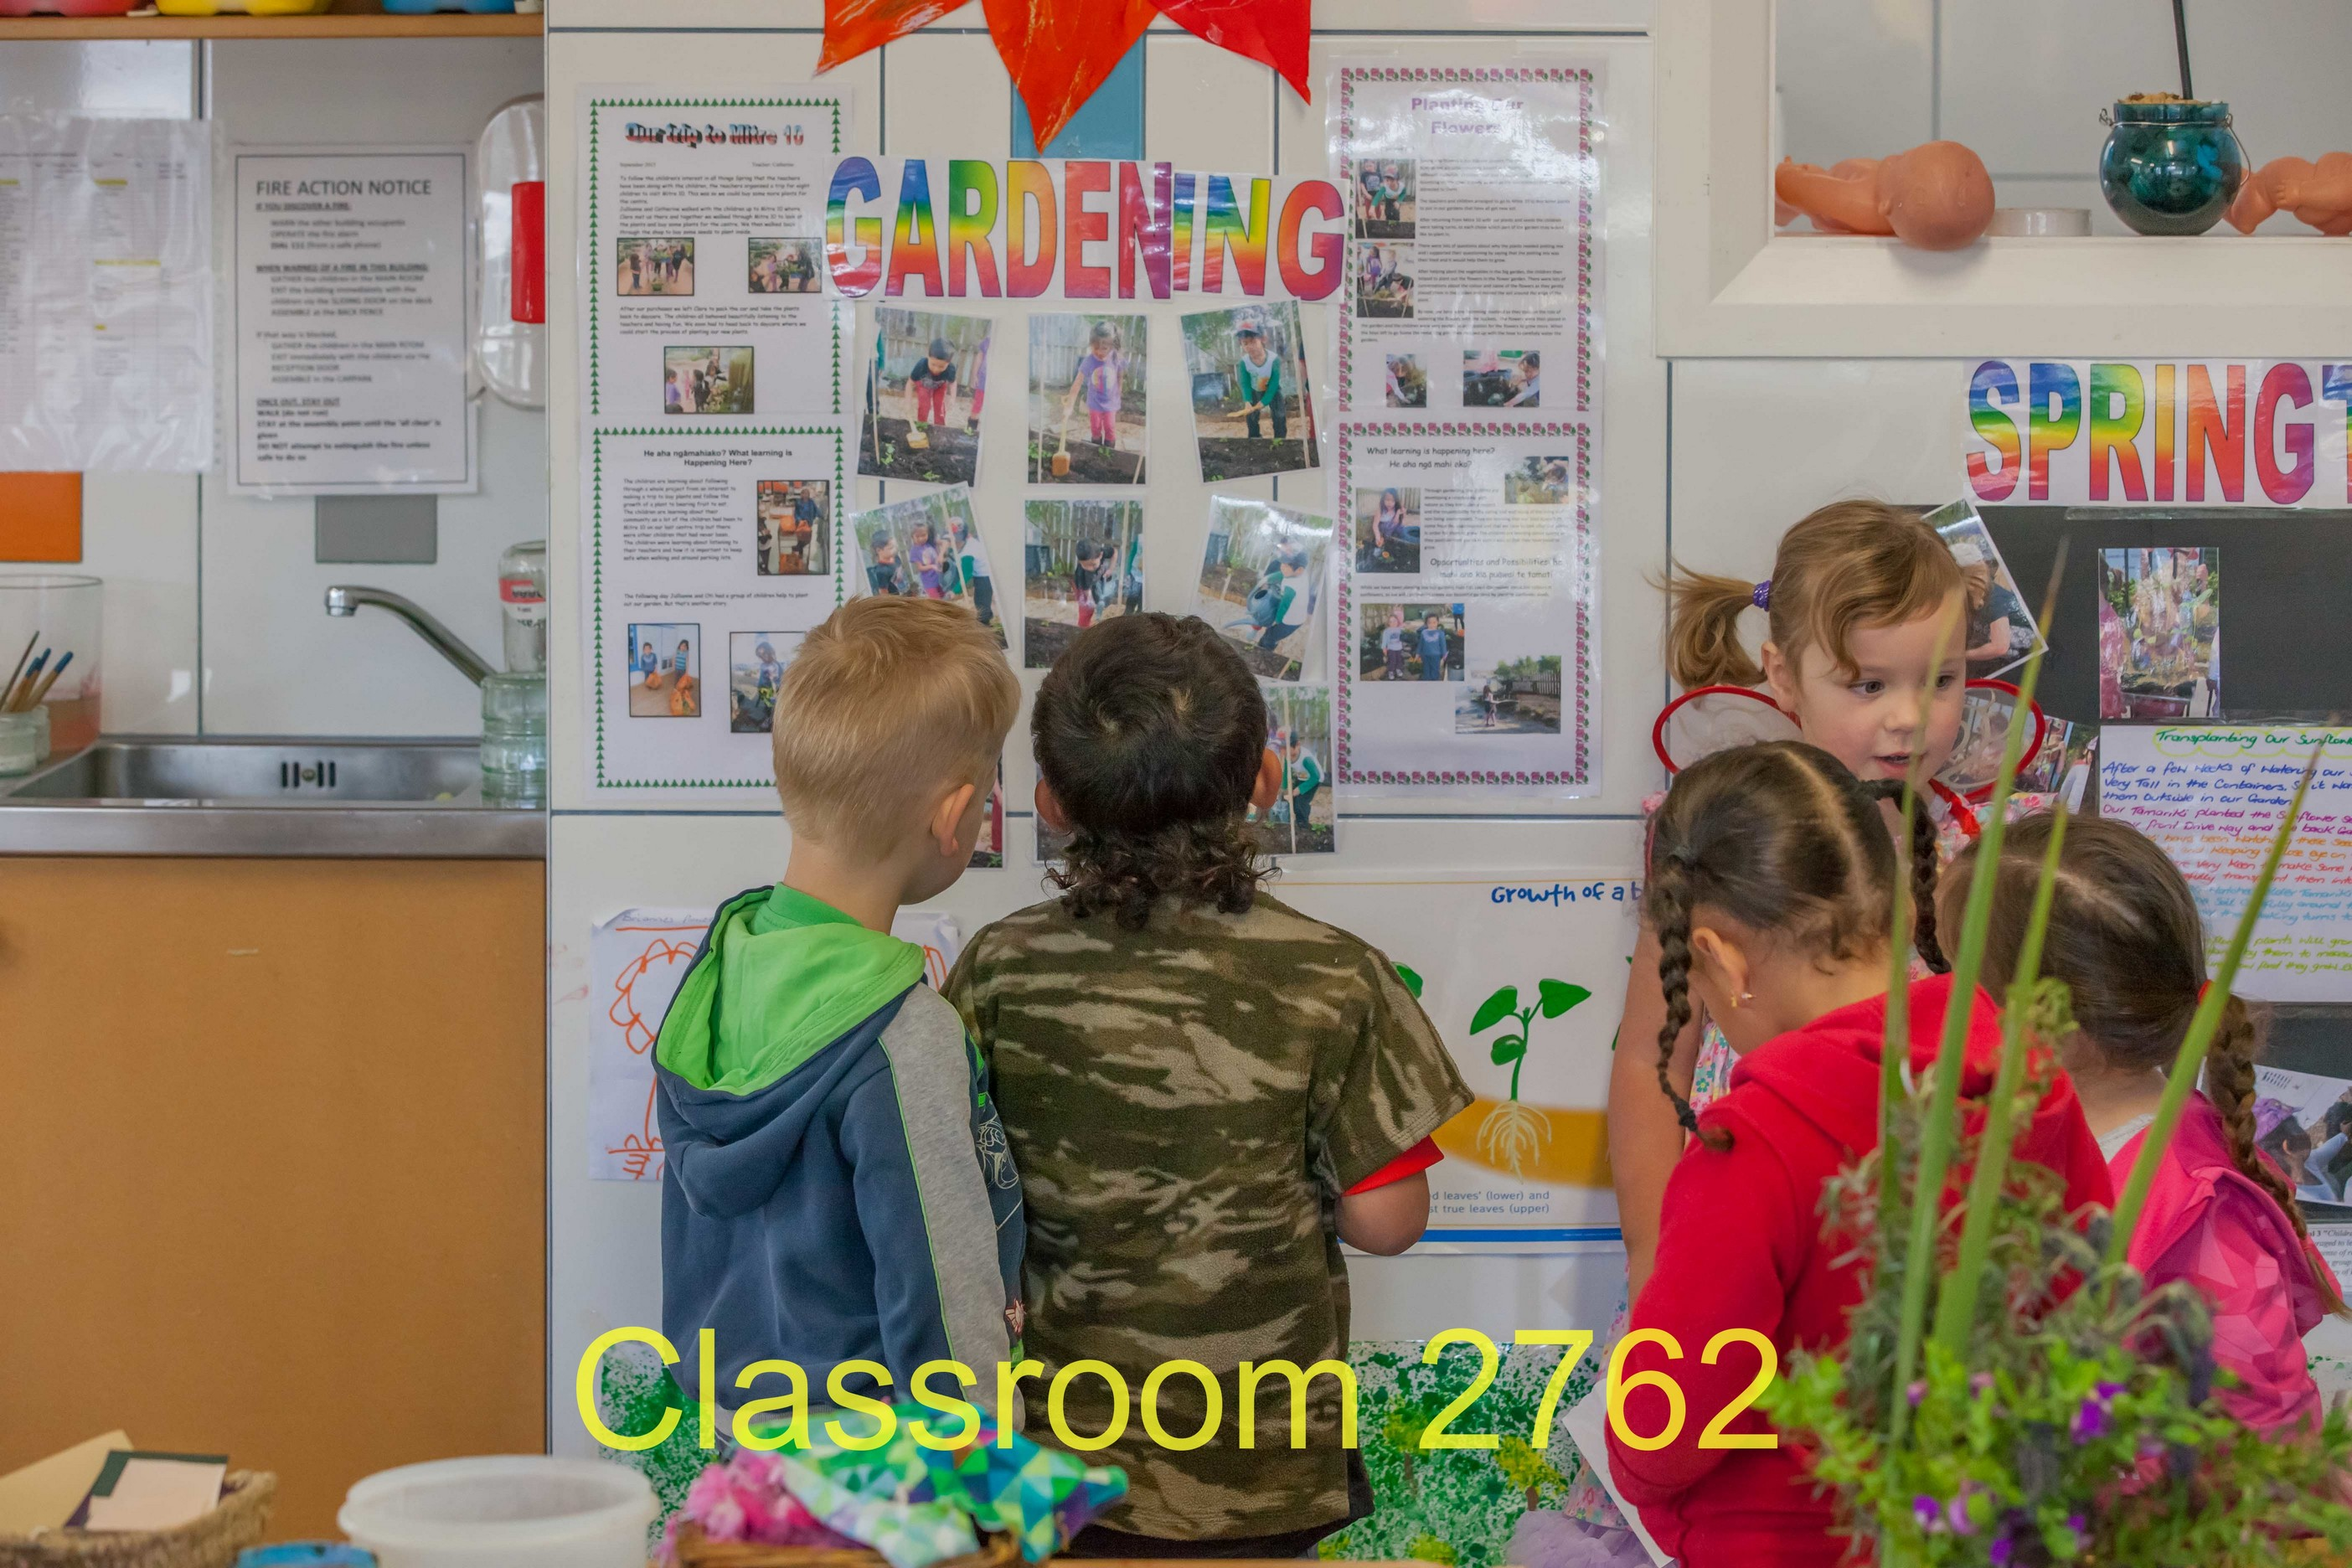 Classroom 2762